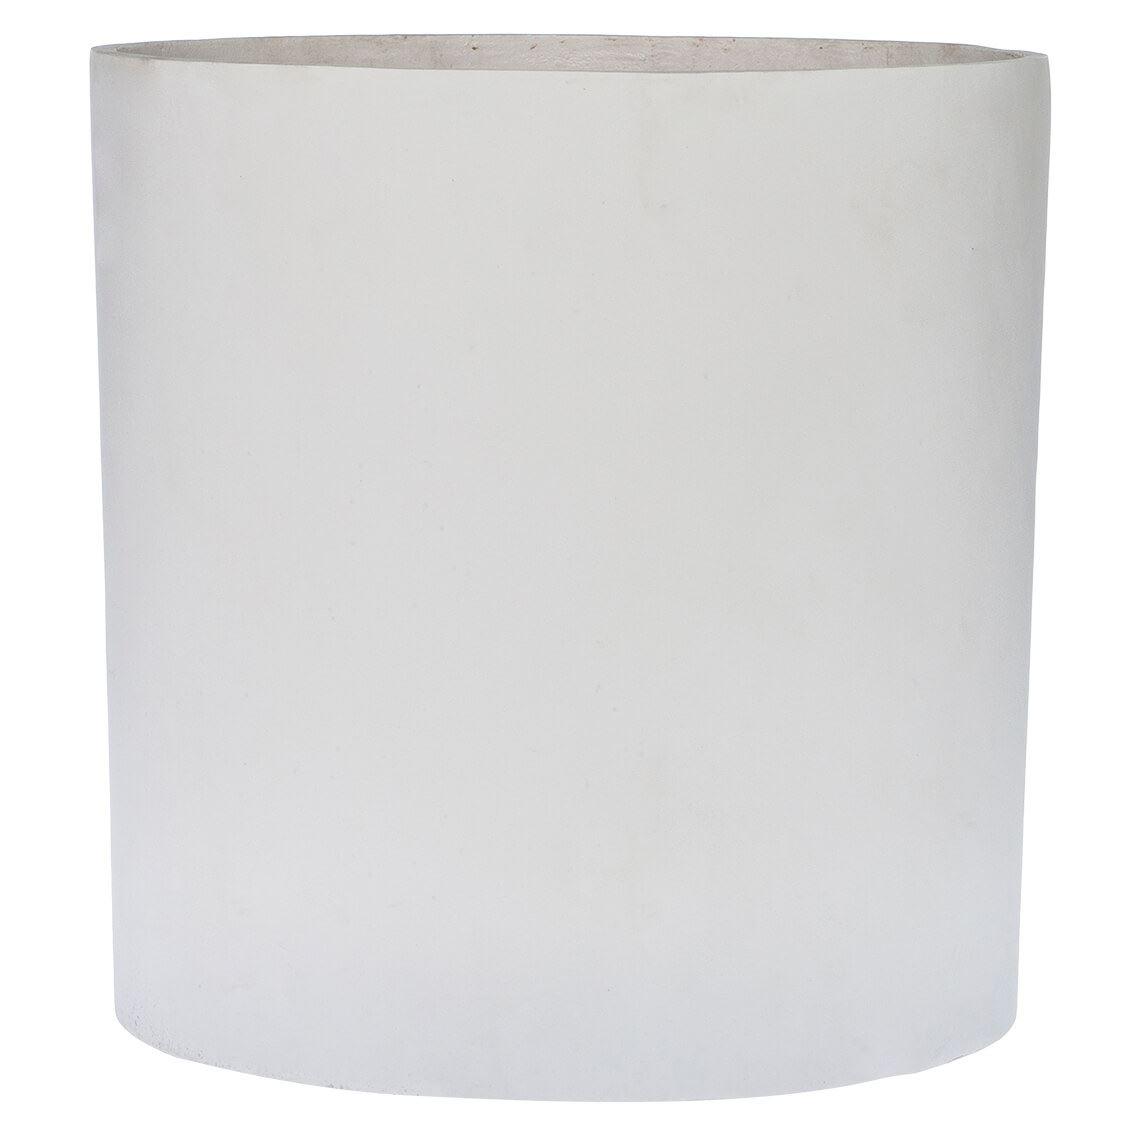 Akiyo Large Planter Size W 38cm x D 38cm x H 38cm in White 50% Poly Resin/50% Stone Powder Freedom